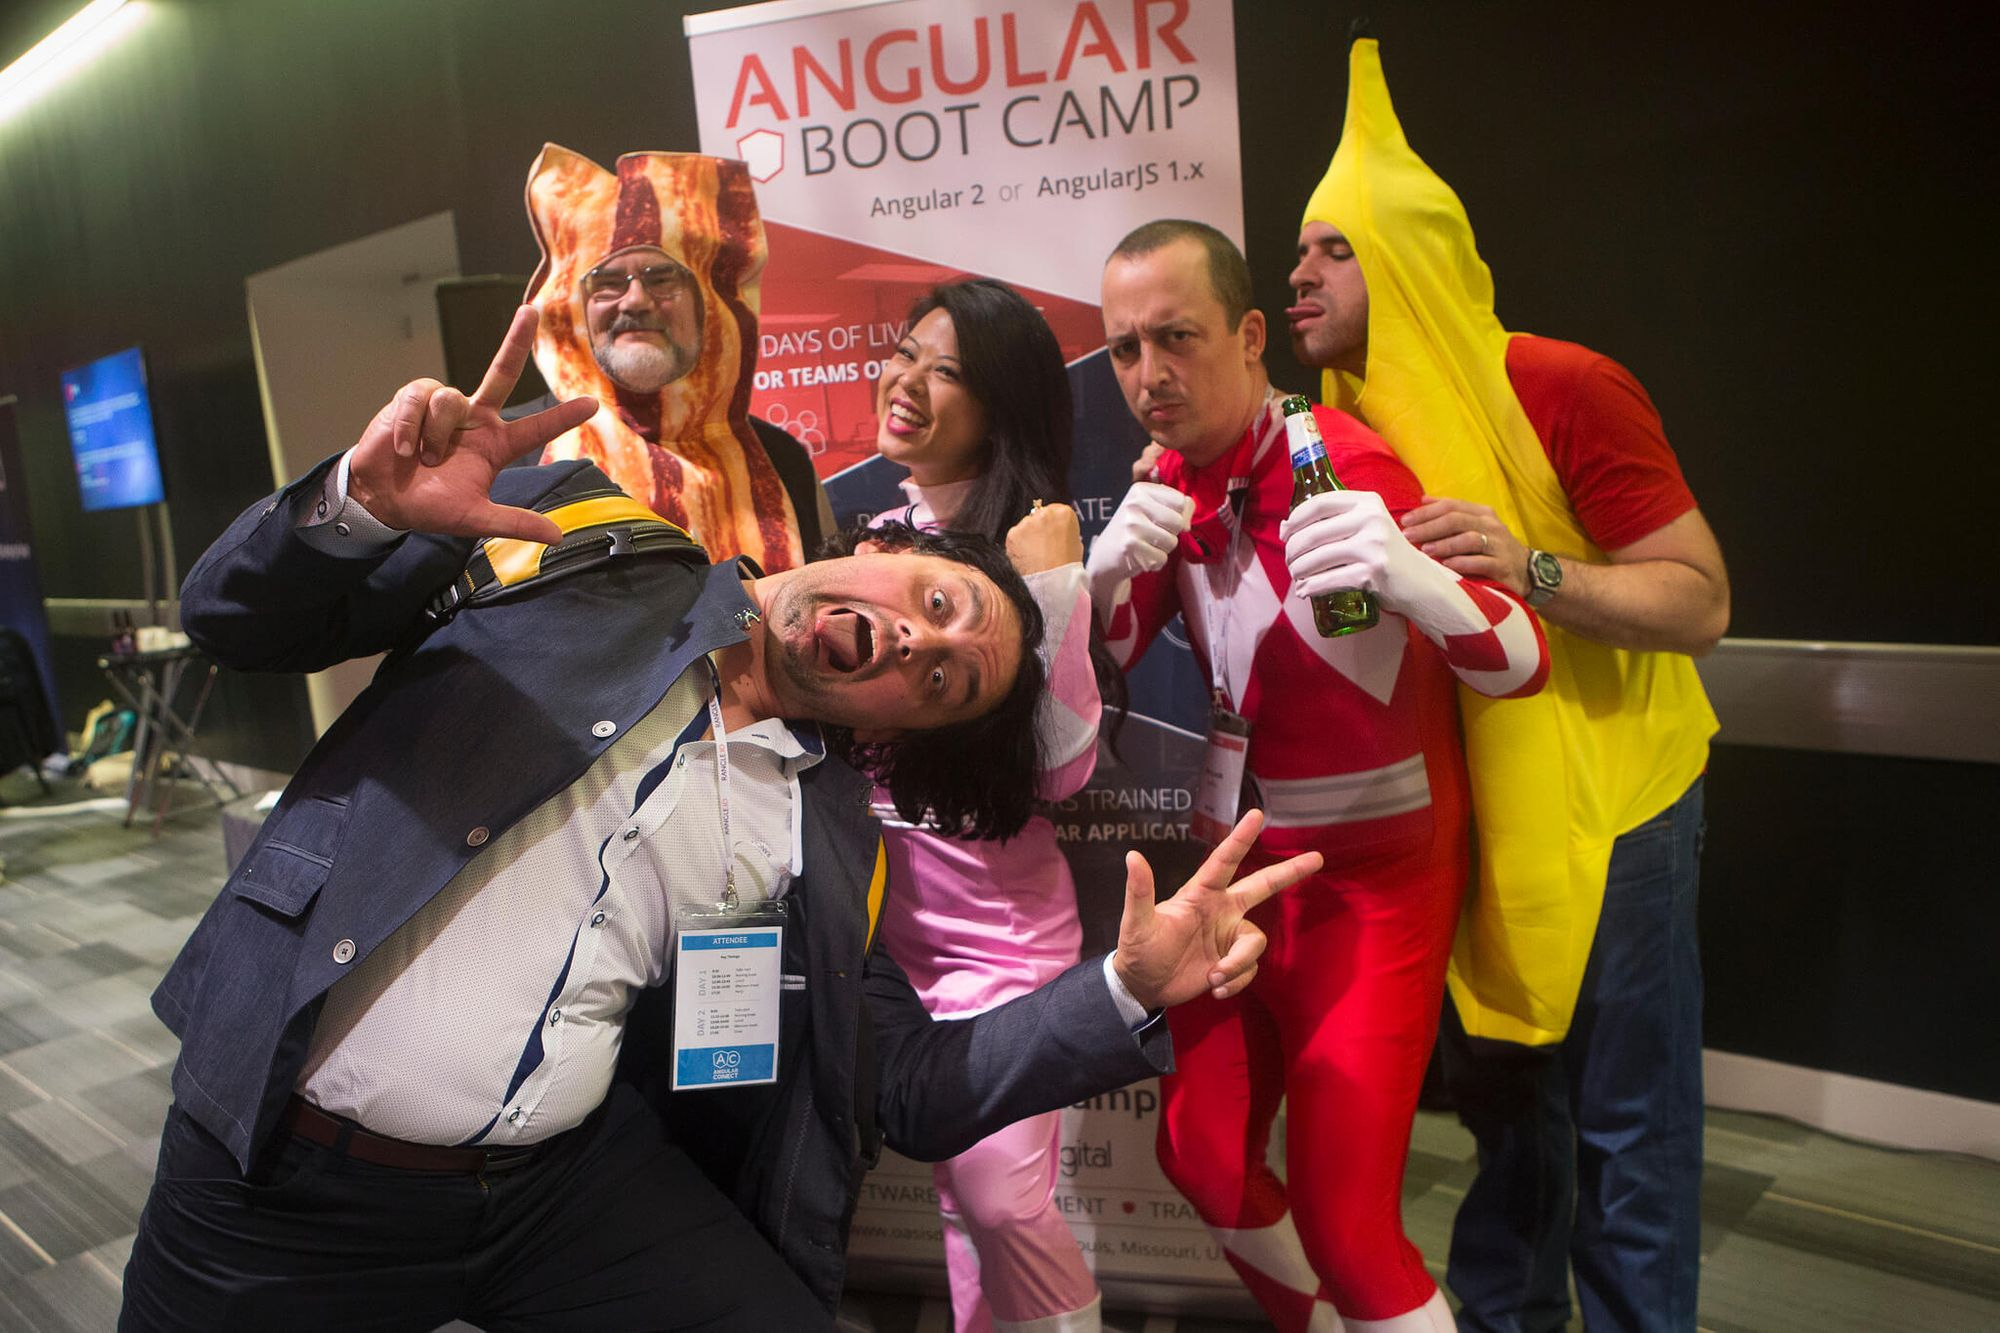 Angular 2 programmers